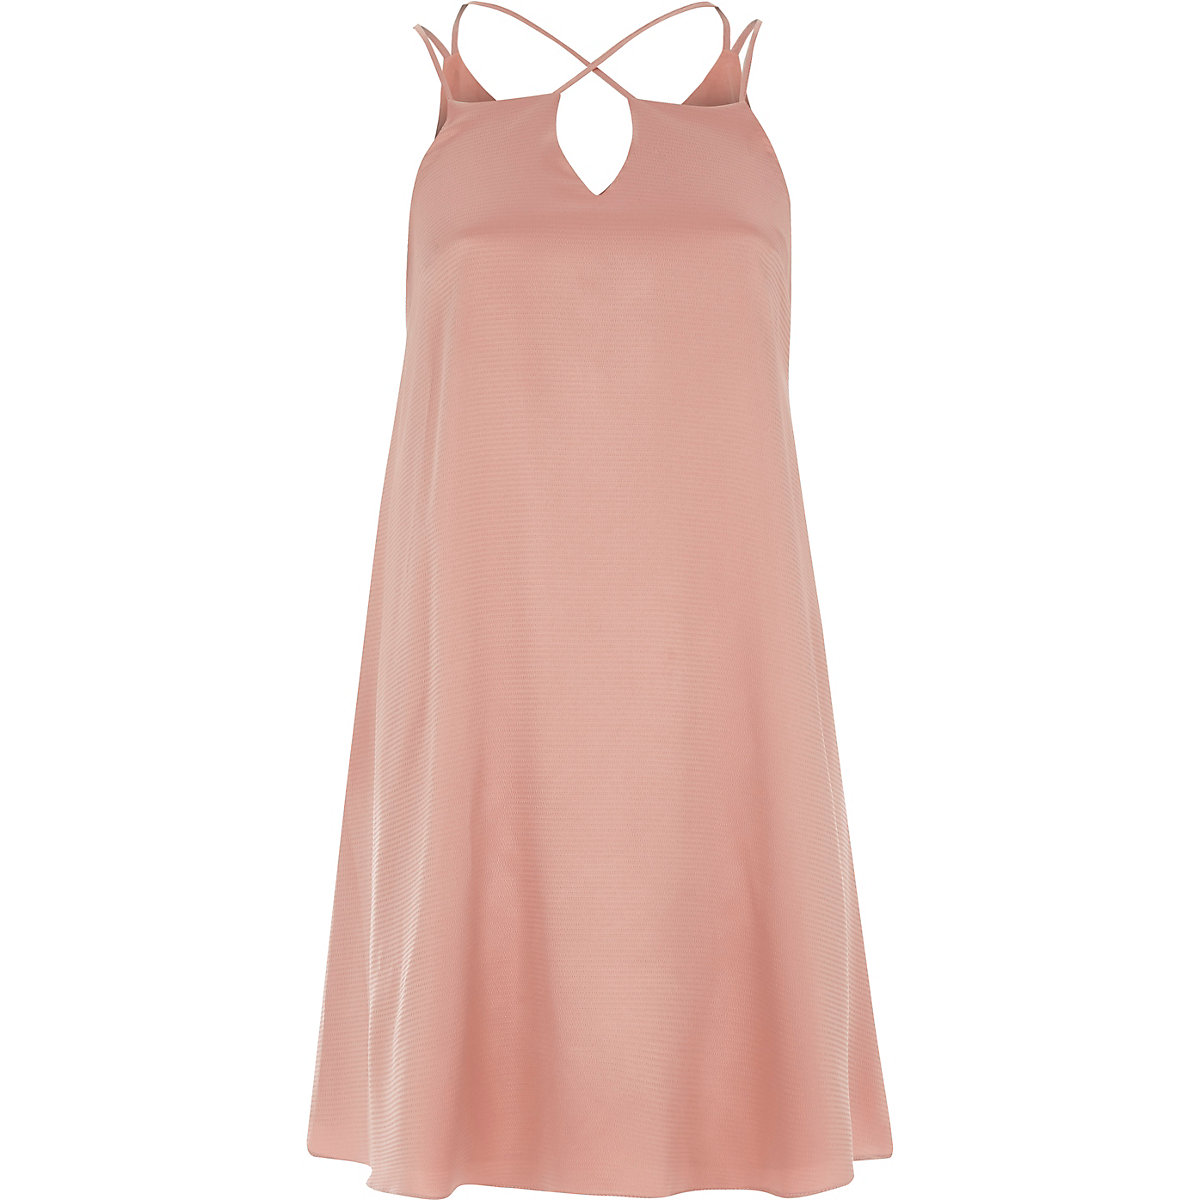 Light pink cross strap slip dress